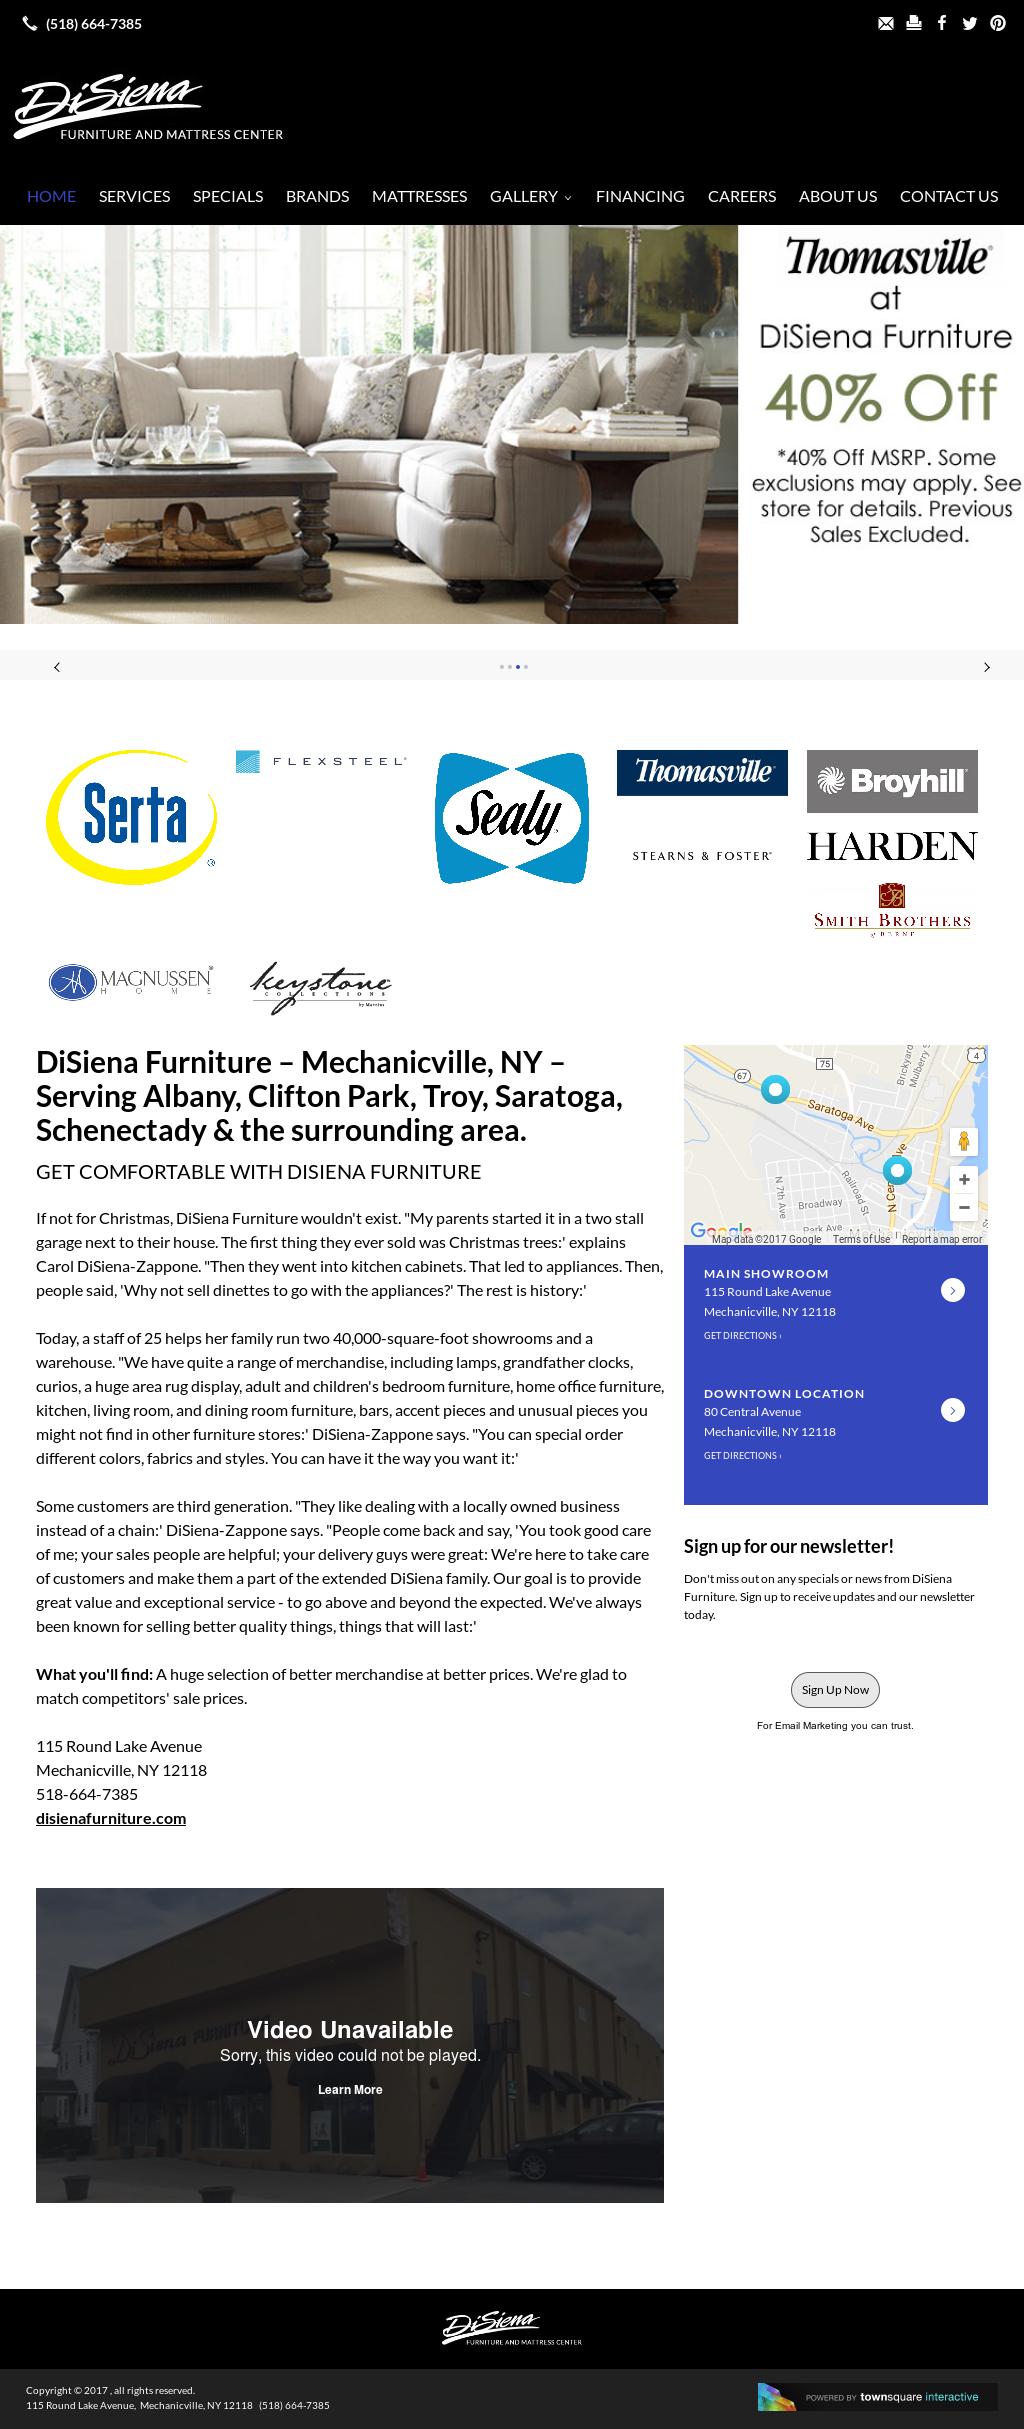 DiSiena Furniture Website History